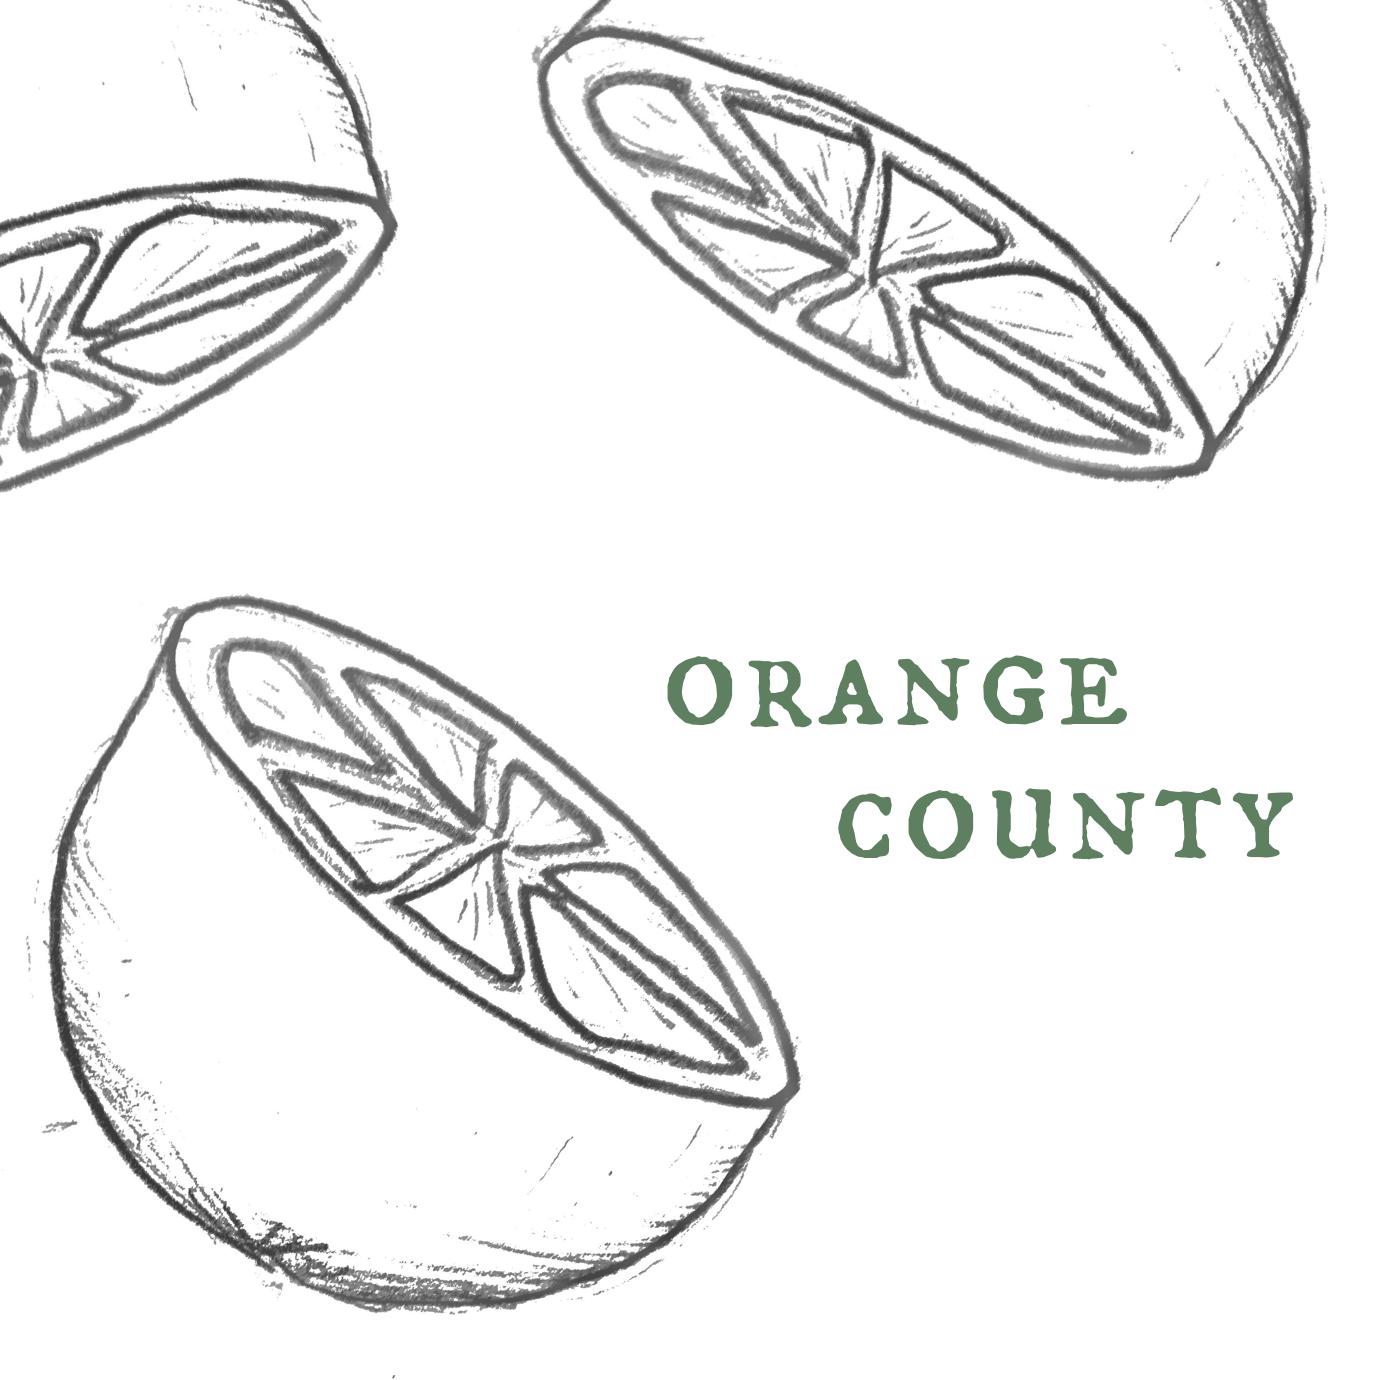 Orange County.png